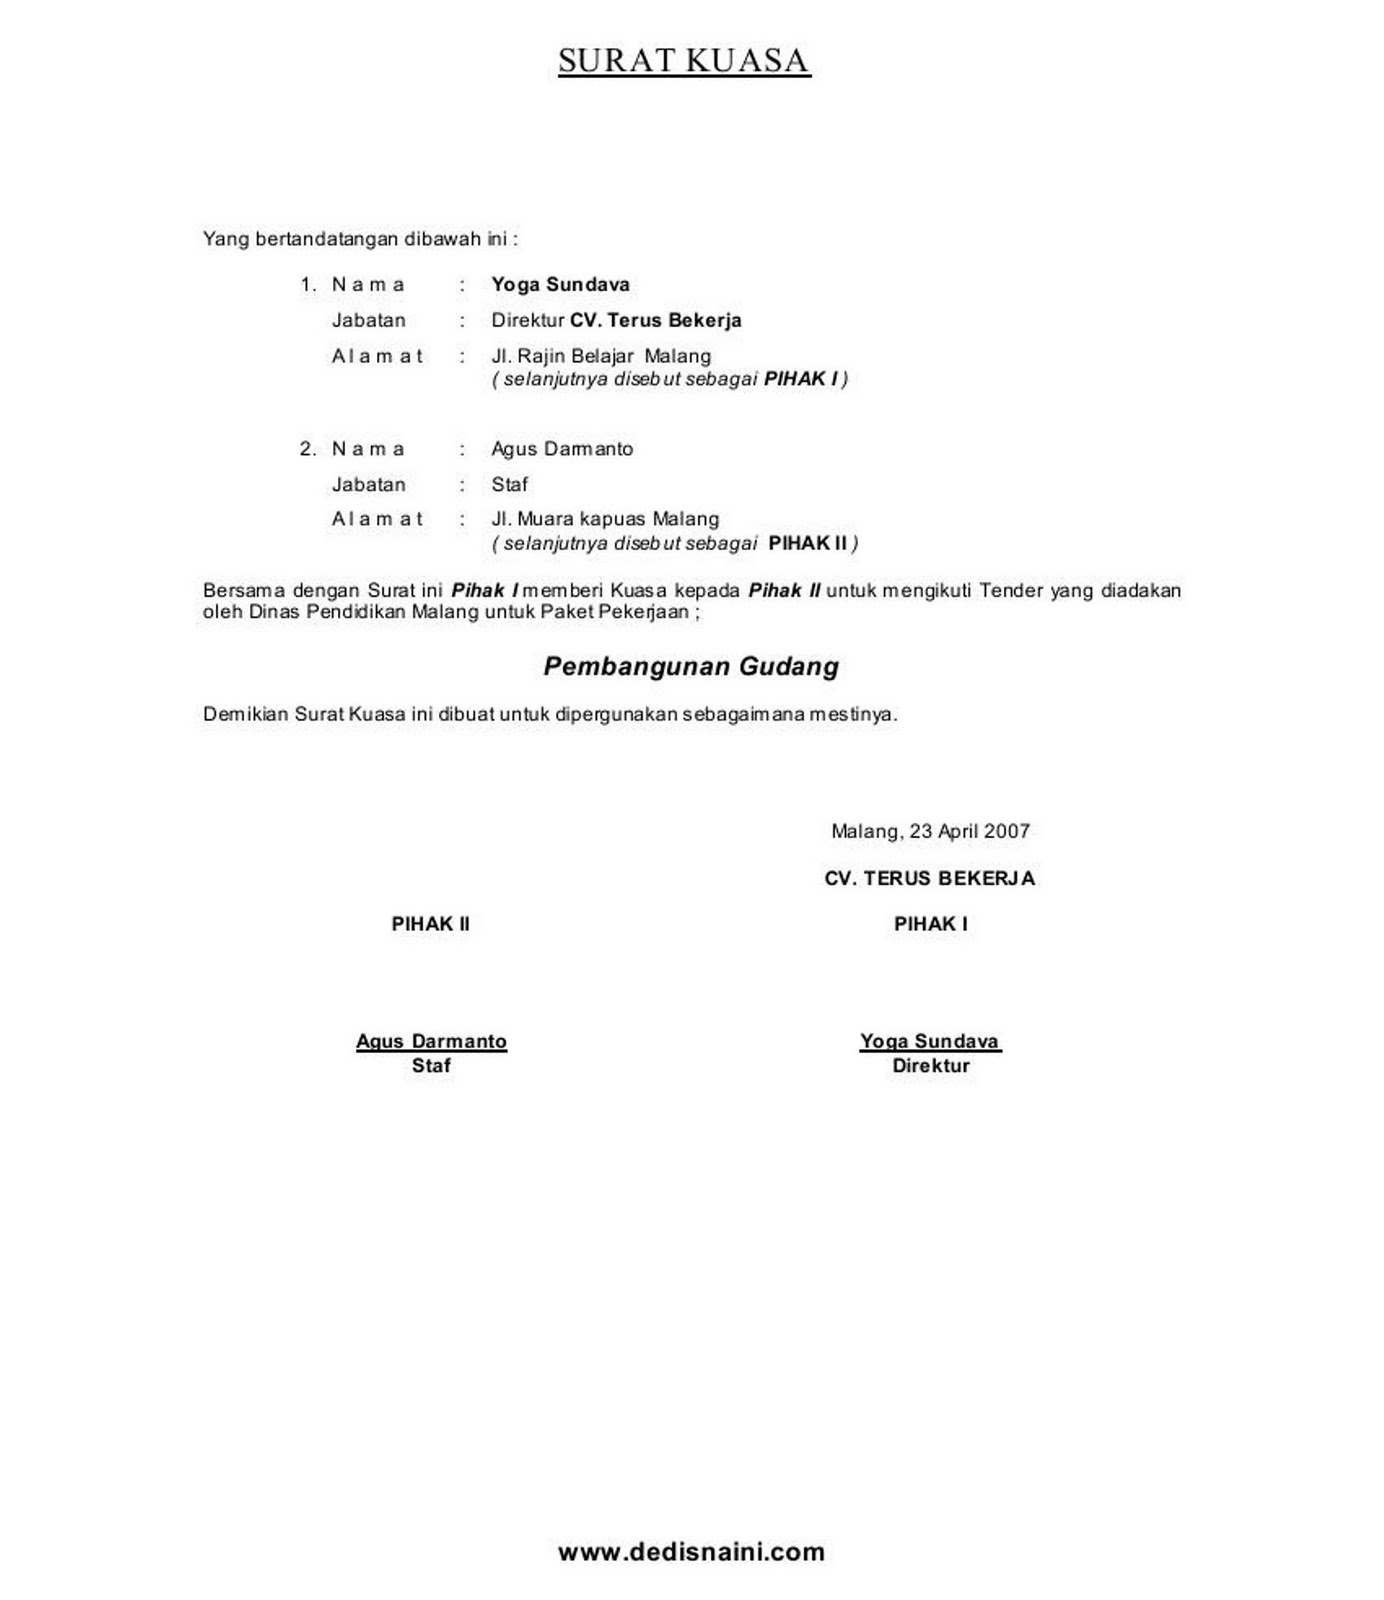 Contoh Surat Kuasa Acara Perdata - Surat 35